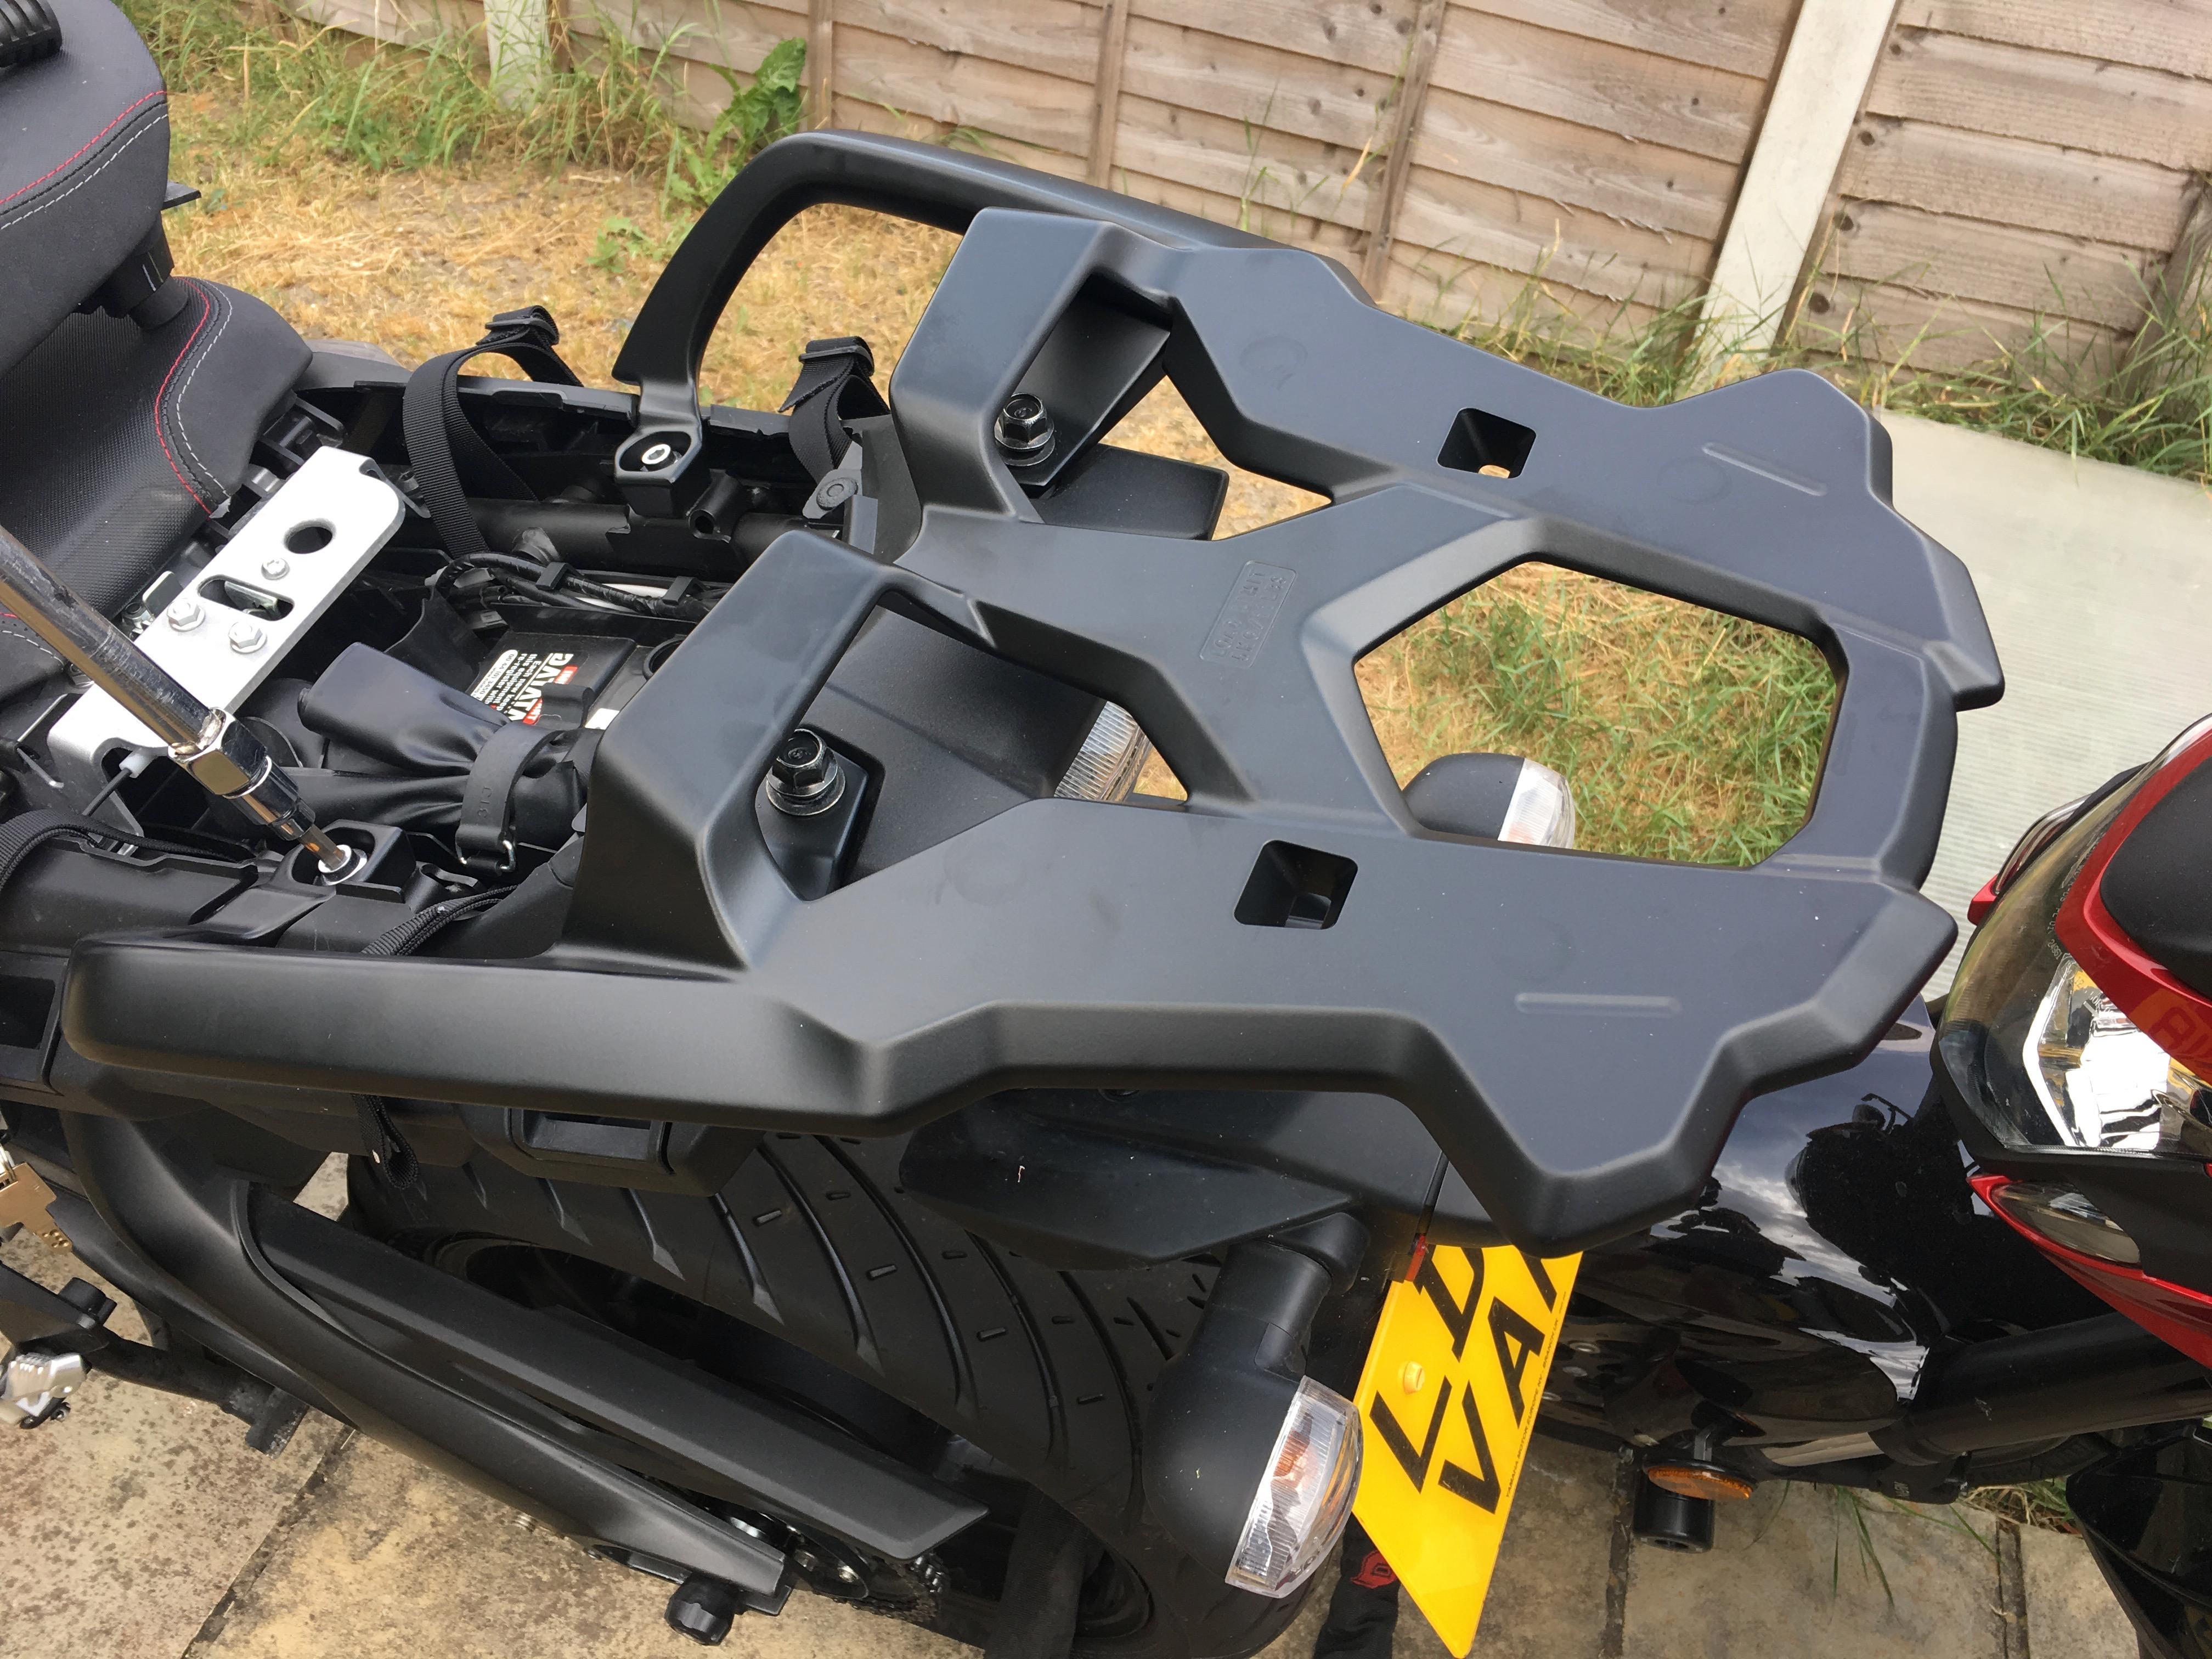 Yamaha Tracer top box rack